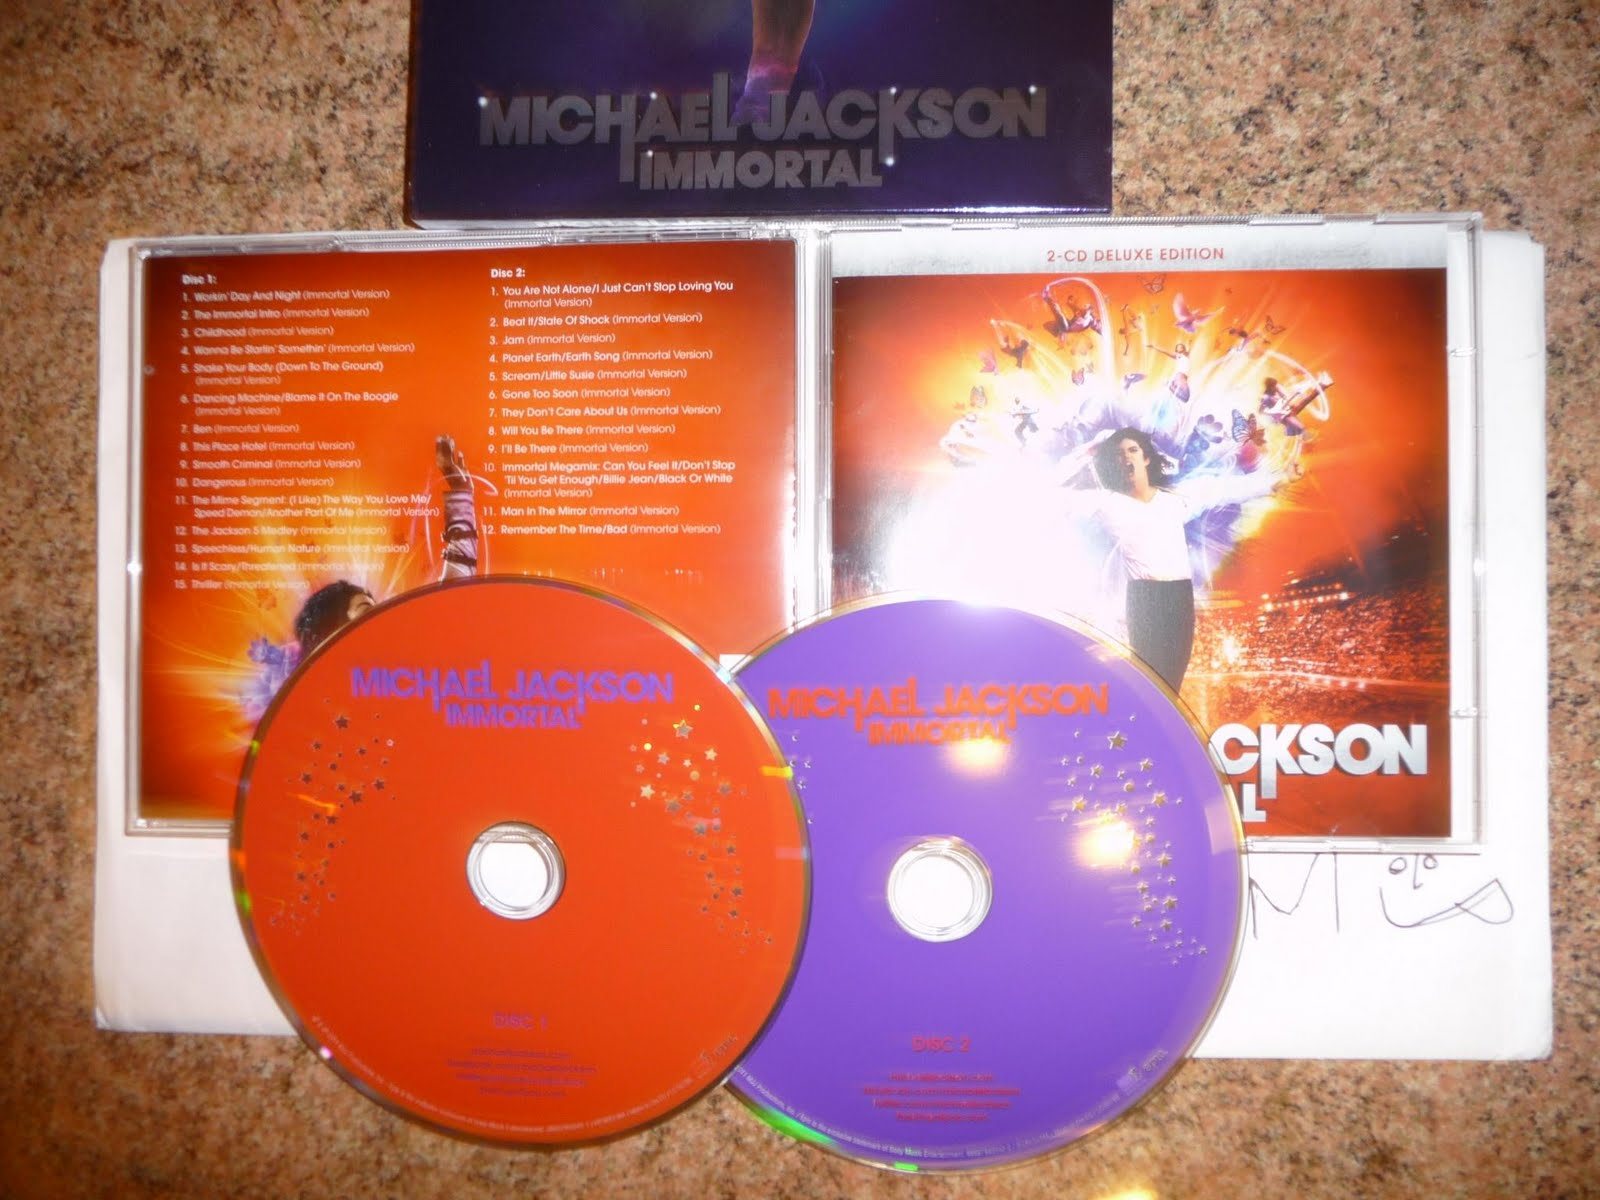 http://1.bp.blogspot.com/-4SfLE5EzbMI/TsSLCV5dY7I/AAAAAAAAT74/jo5-nvkDA7k/s1600/Michael_Jackson-Immortal-2CD-2011-BPM.jpg